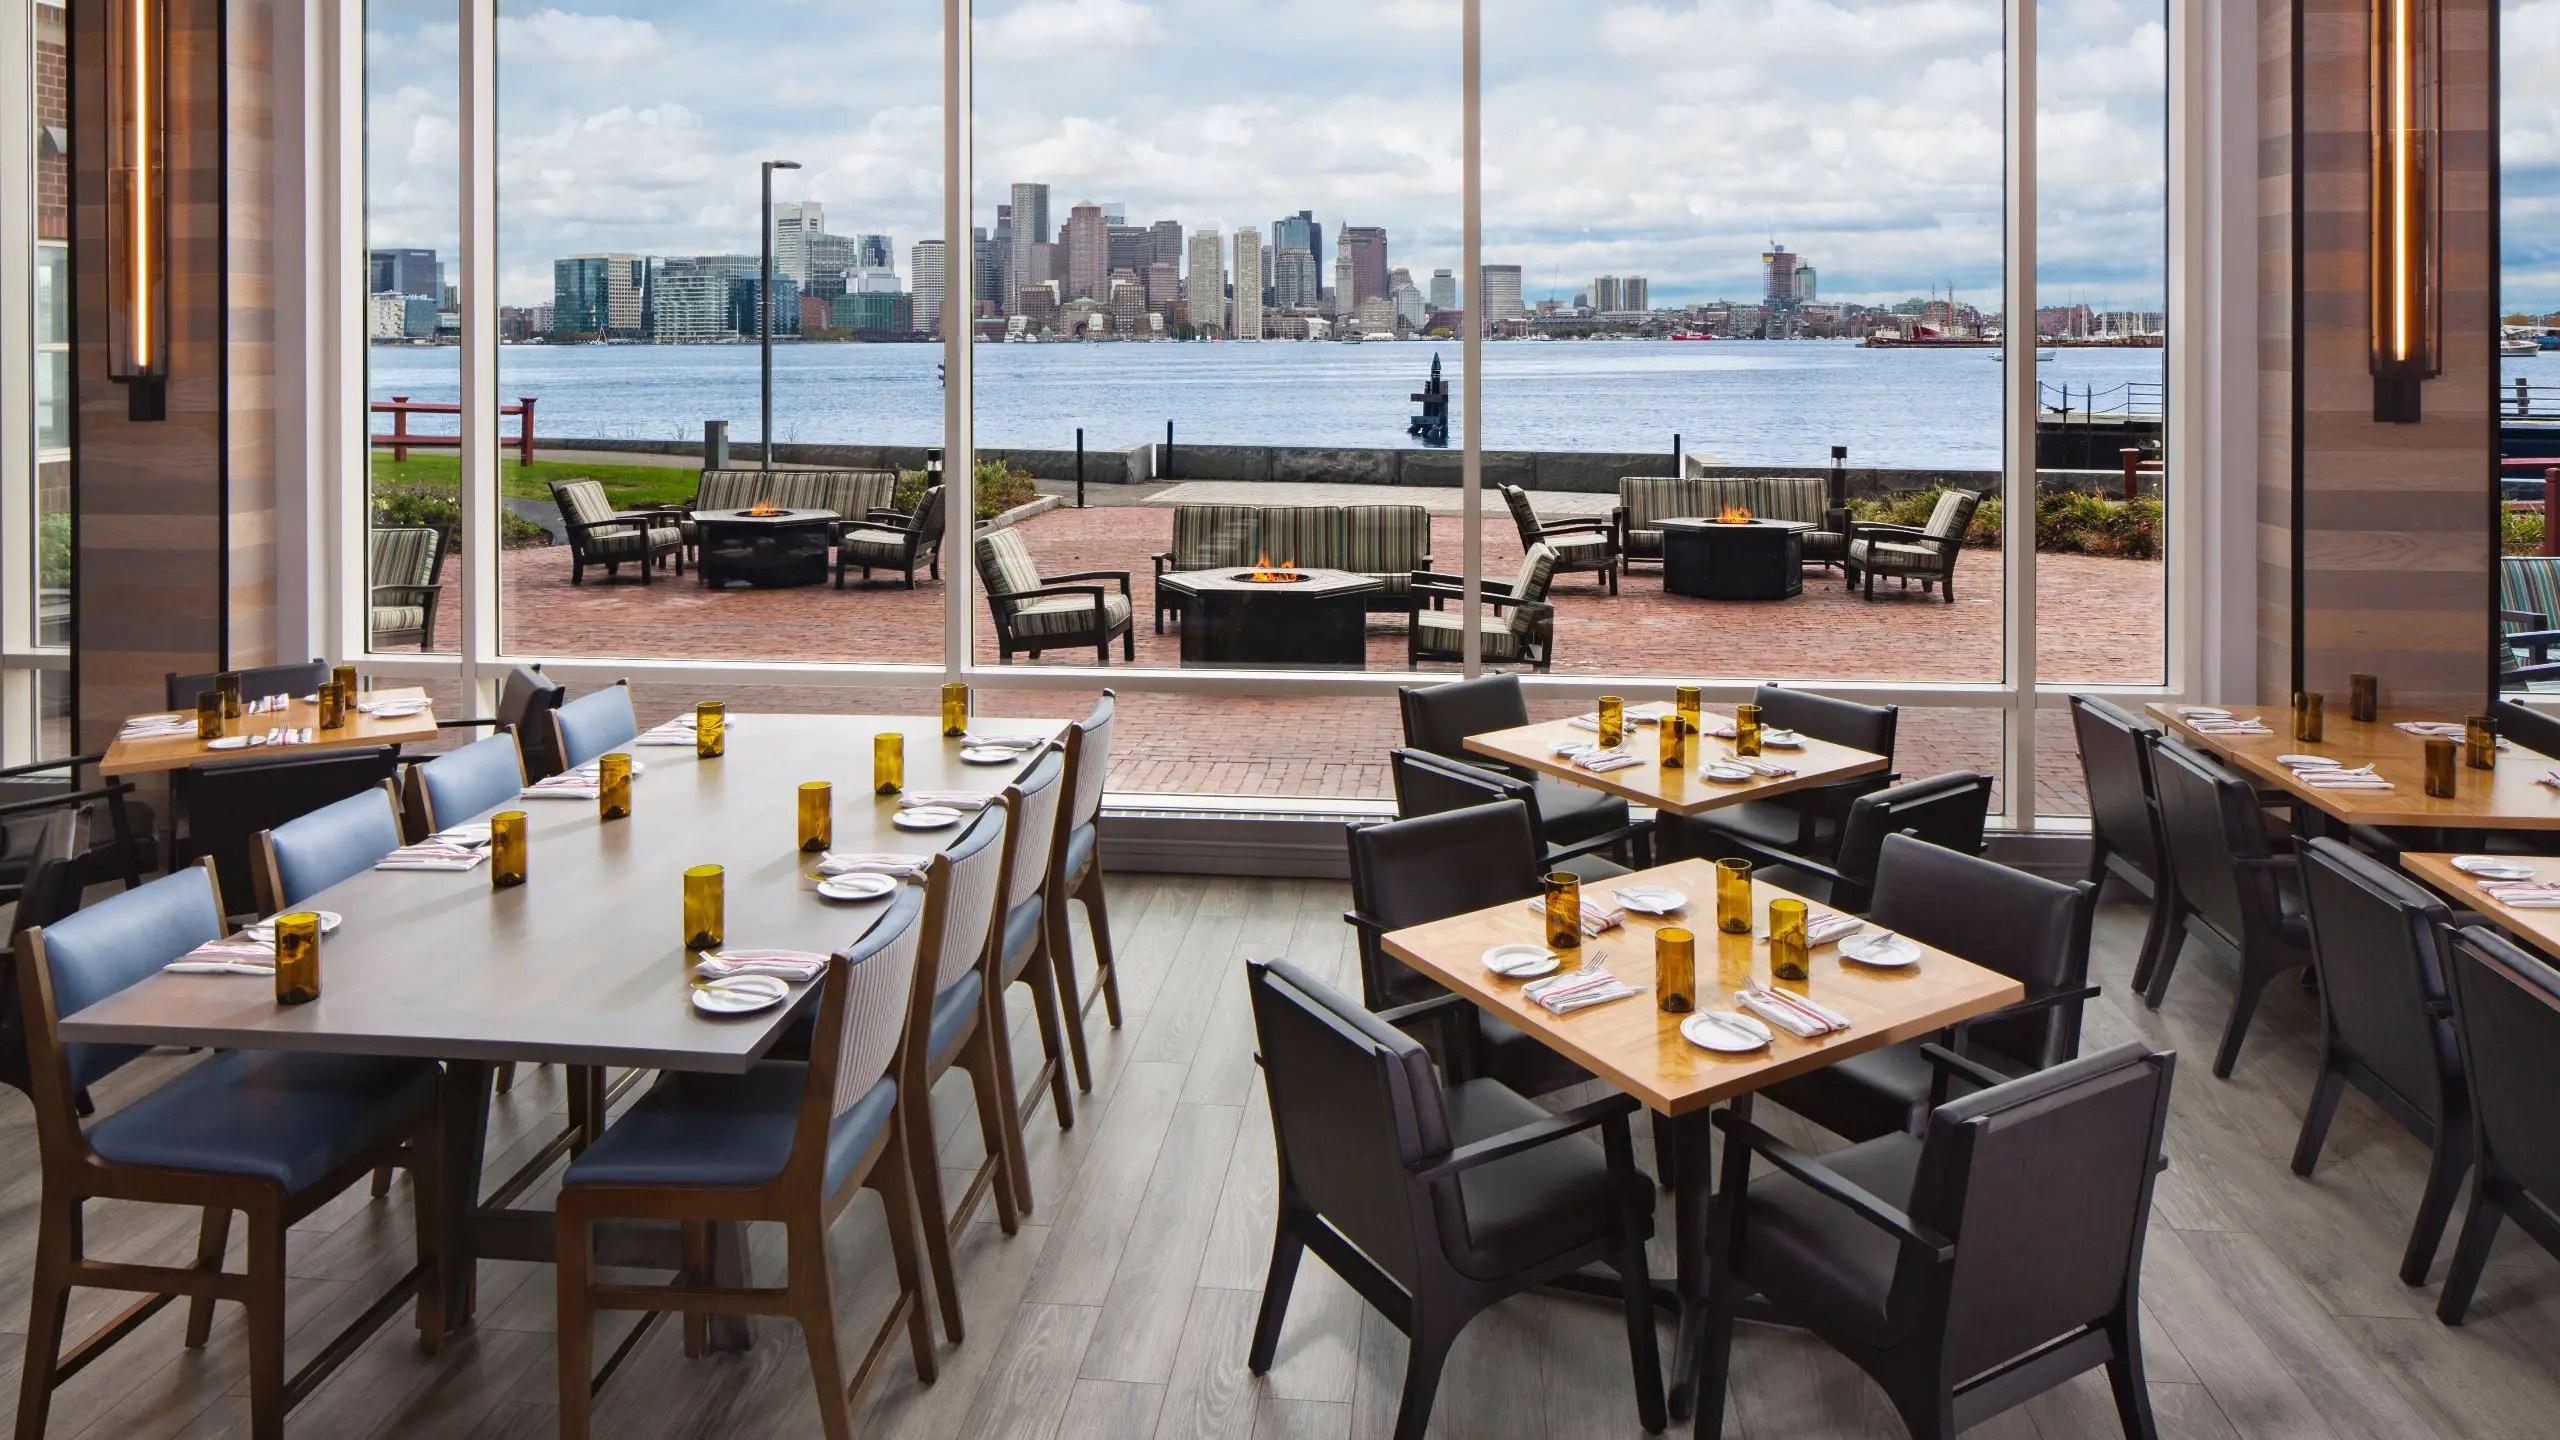 hyatt regency boston harbor